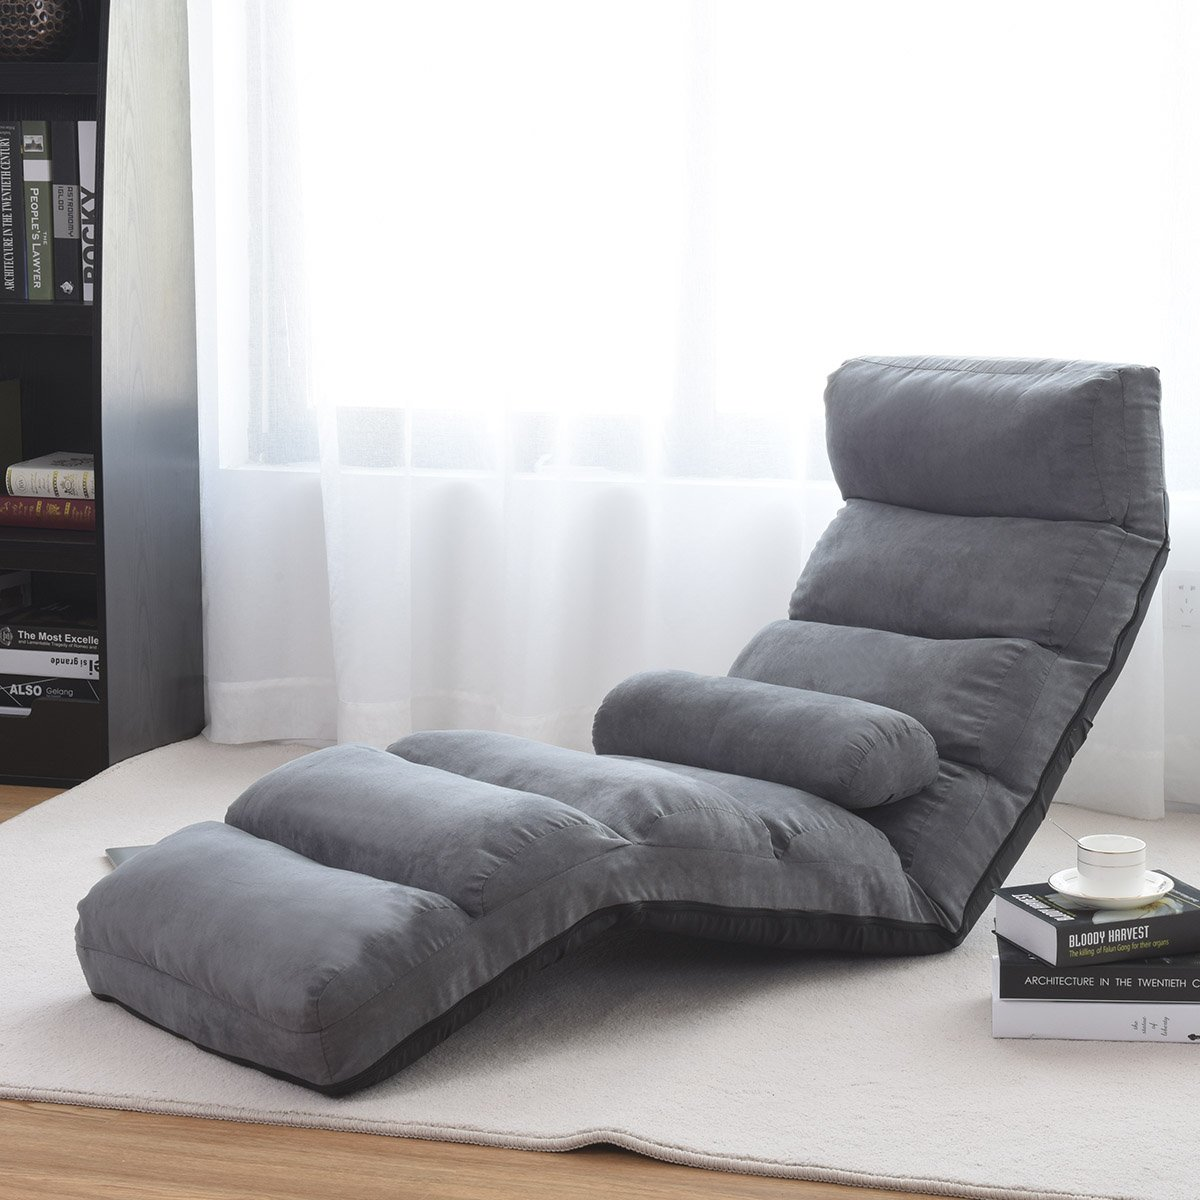 Amazon.com: Giantex plegable piso sofá, silla ajustable Lazy ...